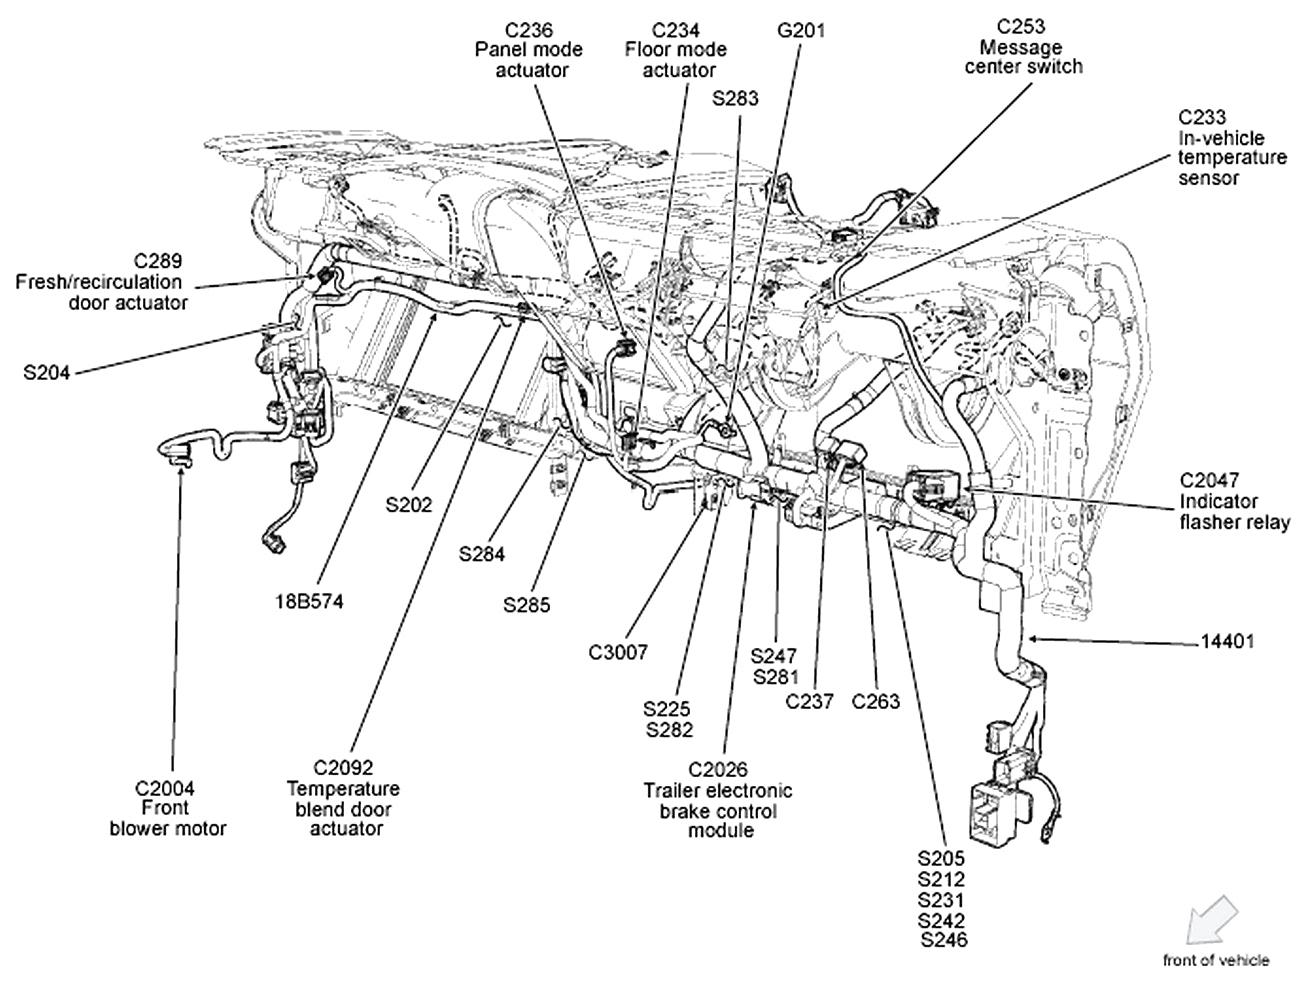 Incredible Diagram Of Ford F 150 V8 Engine Wiring Diagram Wiring Cloud Monangrecoveryedborg